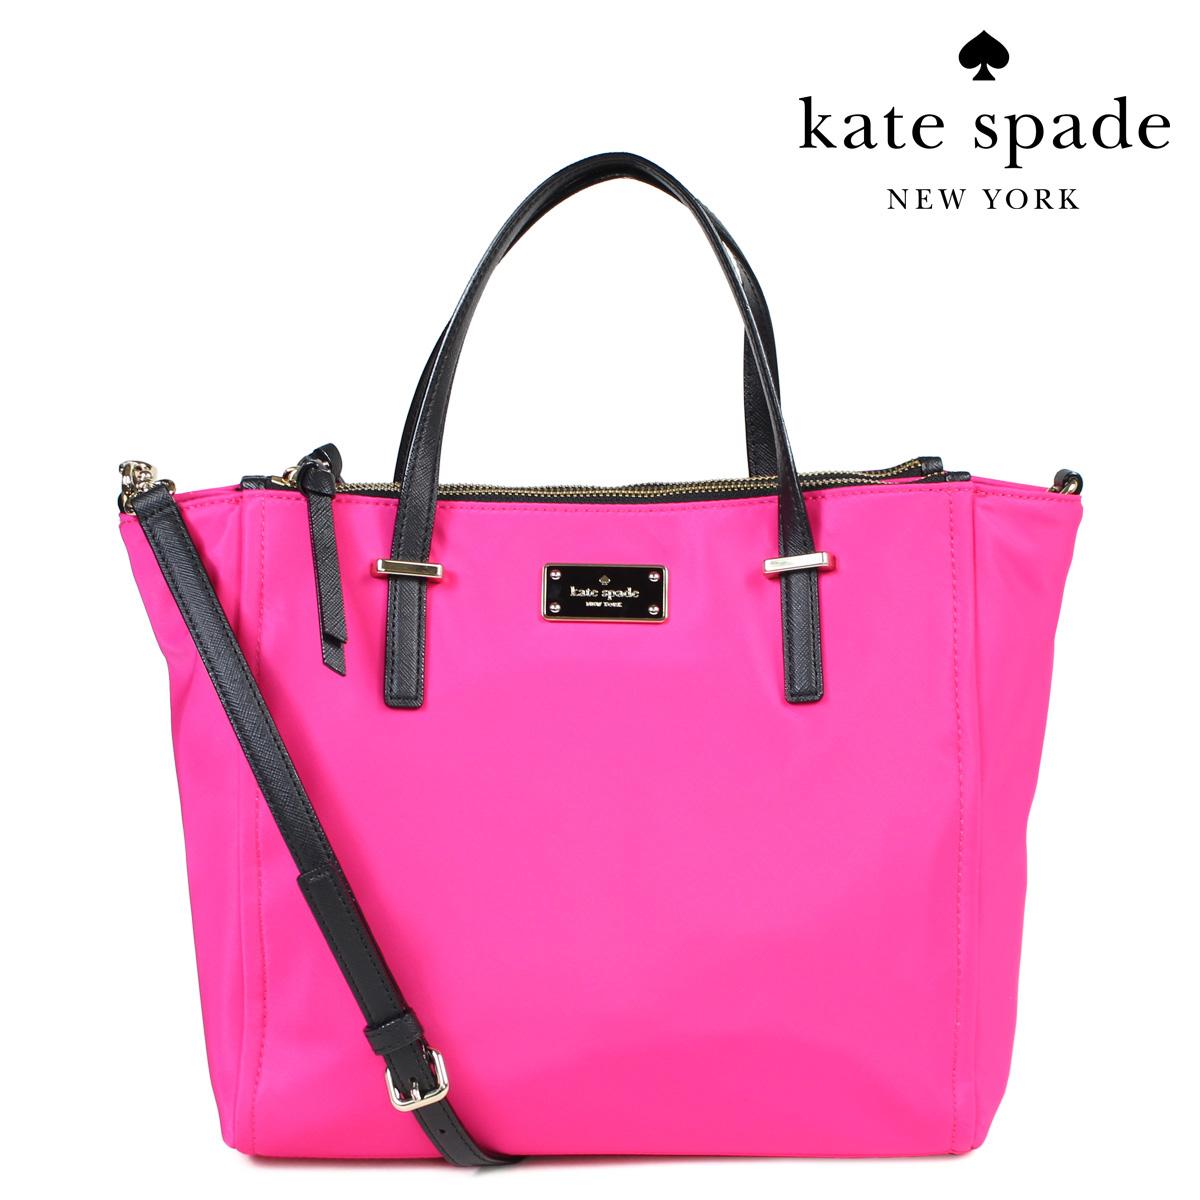 kate spade ALYSE ケイトスペード バッグ トートバッグ ナイロン WKRU4715 649 2WAY レディース ピンク